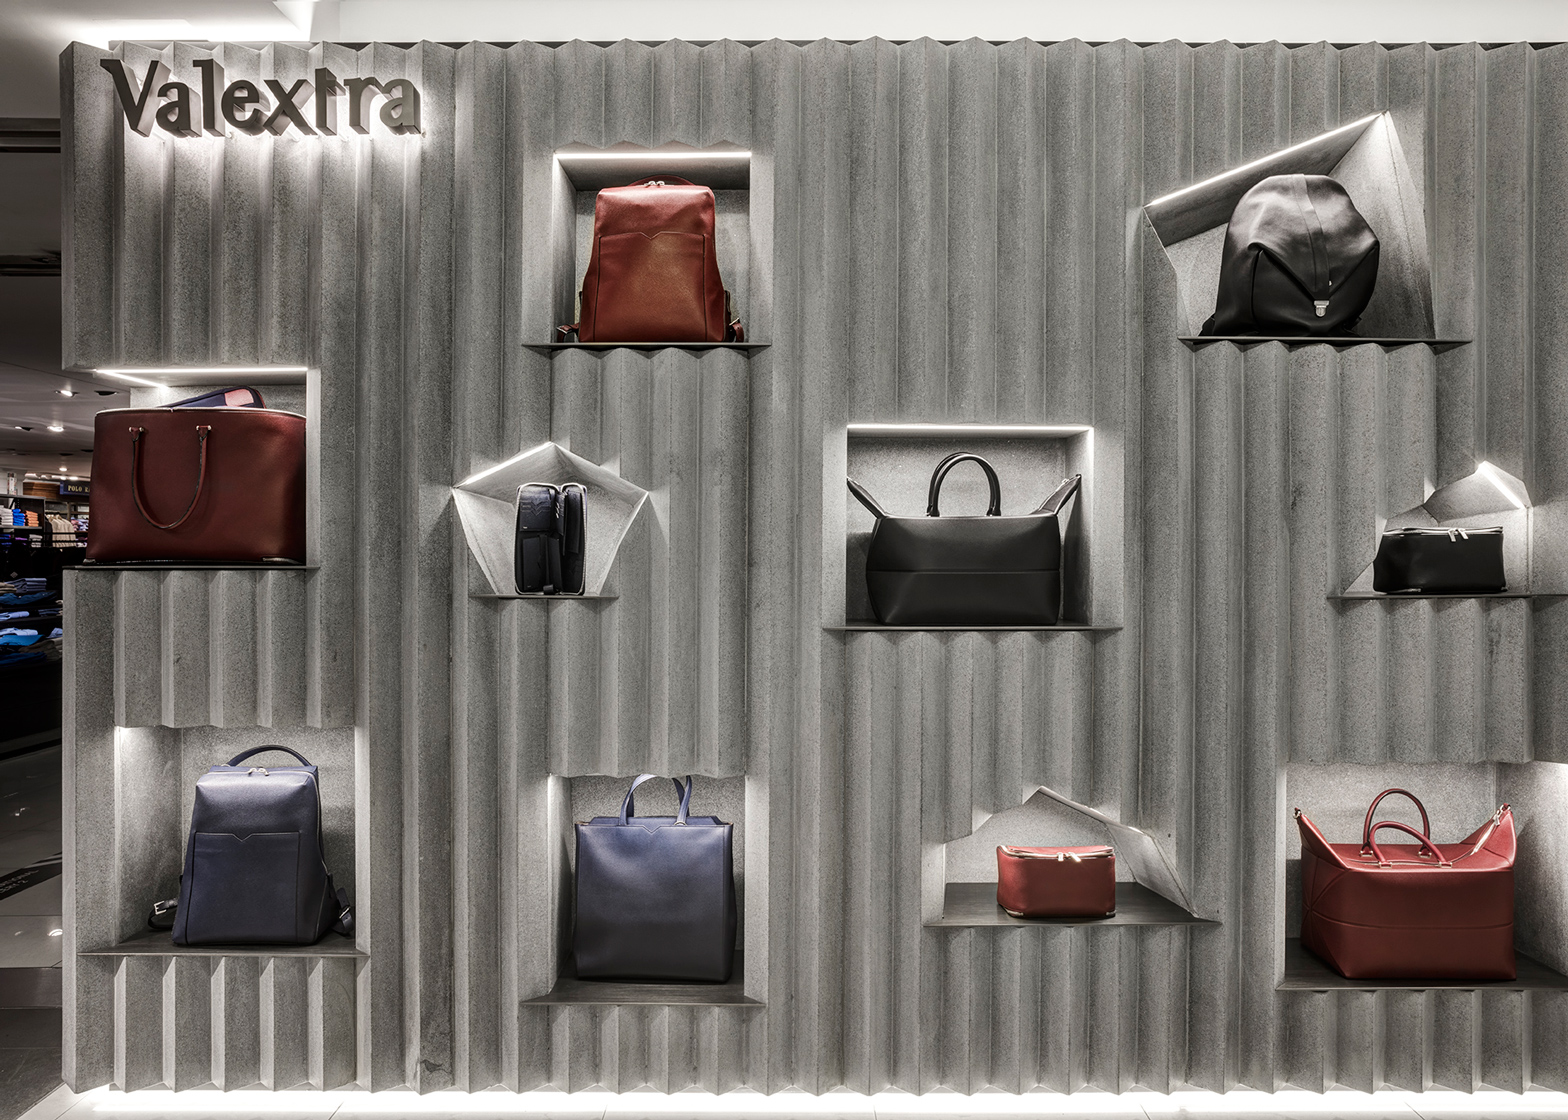 architecture_corrugated_concrete_panels_design_studia_interiors_osnovadesign_osnova_poltava_02